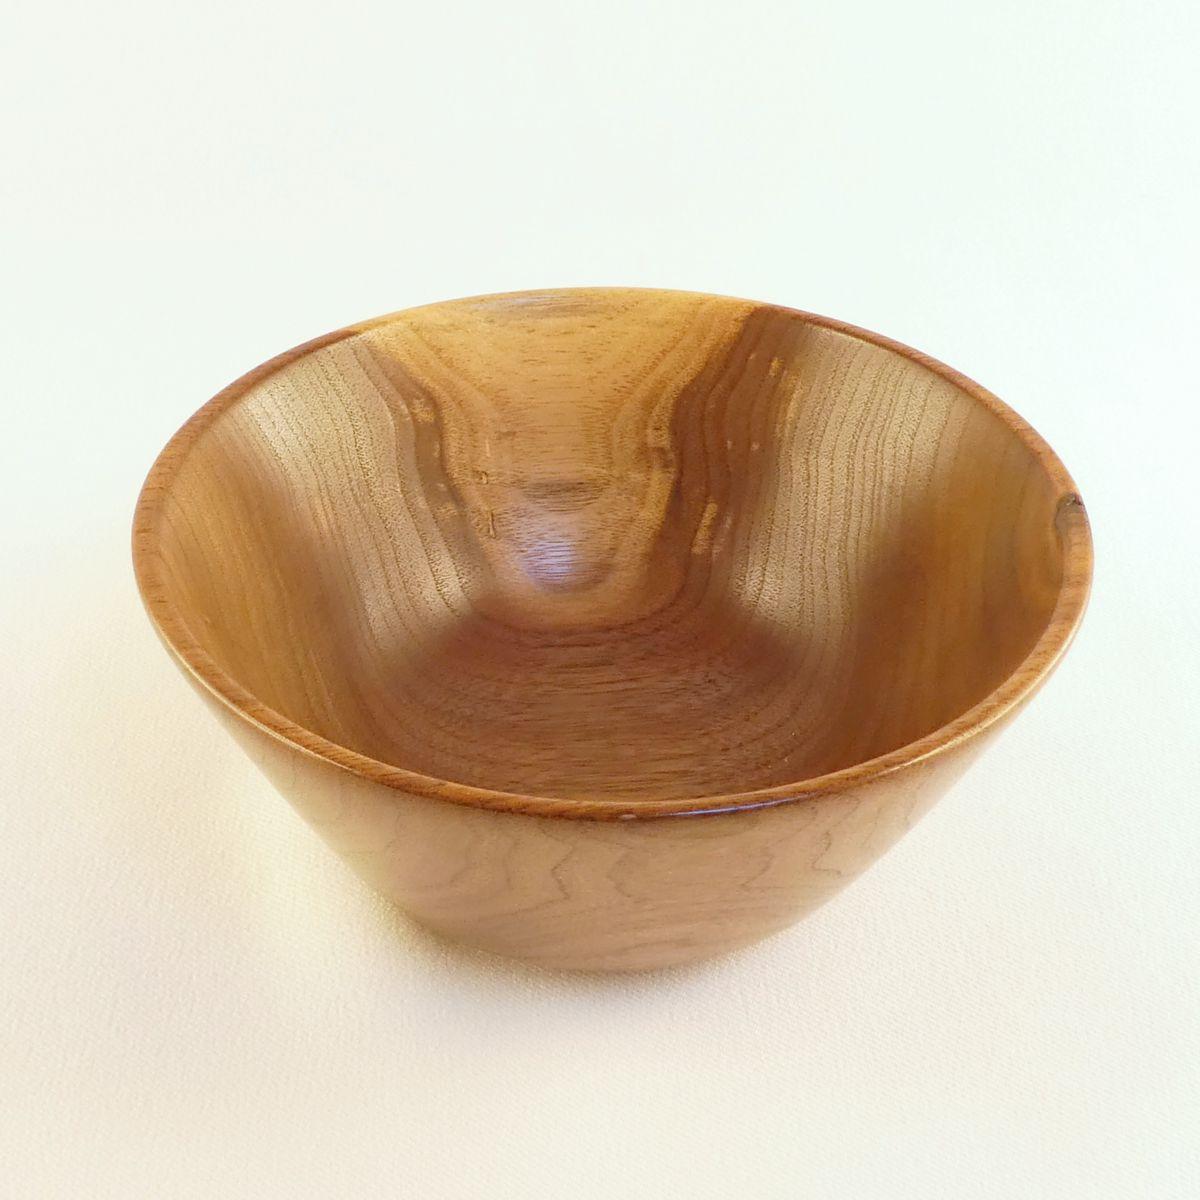 Black walnut striking contrast hand turned wood bowl. Functional art by Cynthia D. Haney